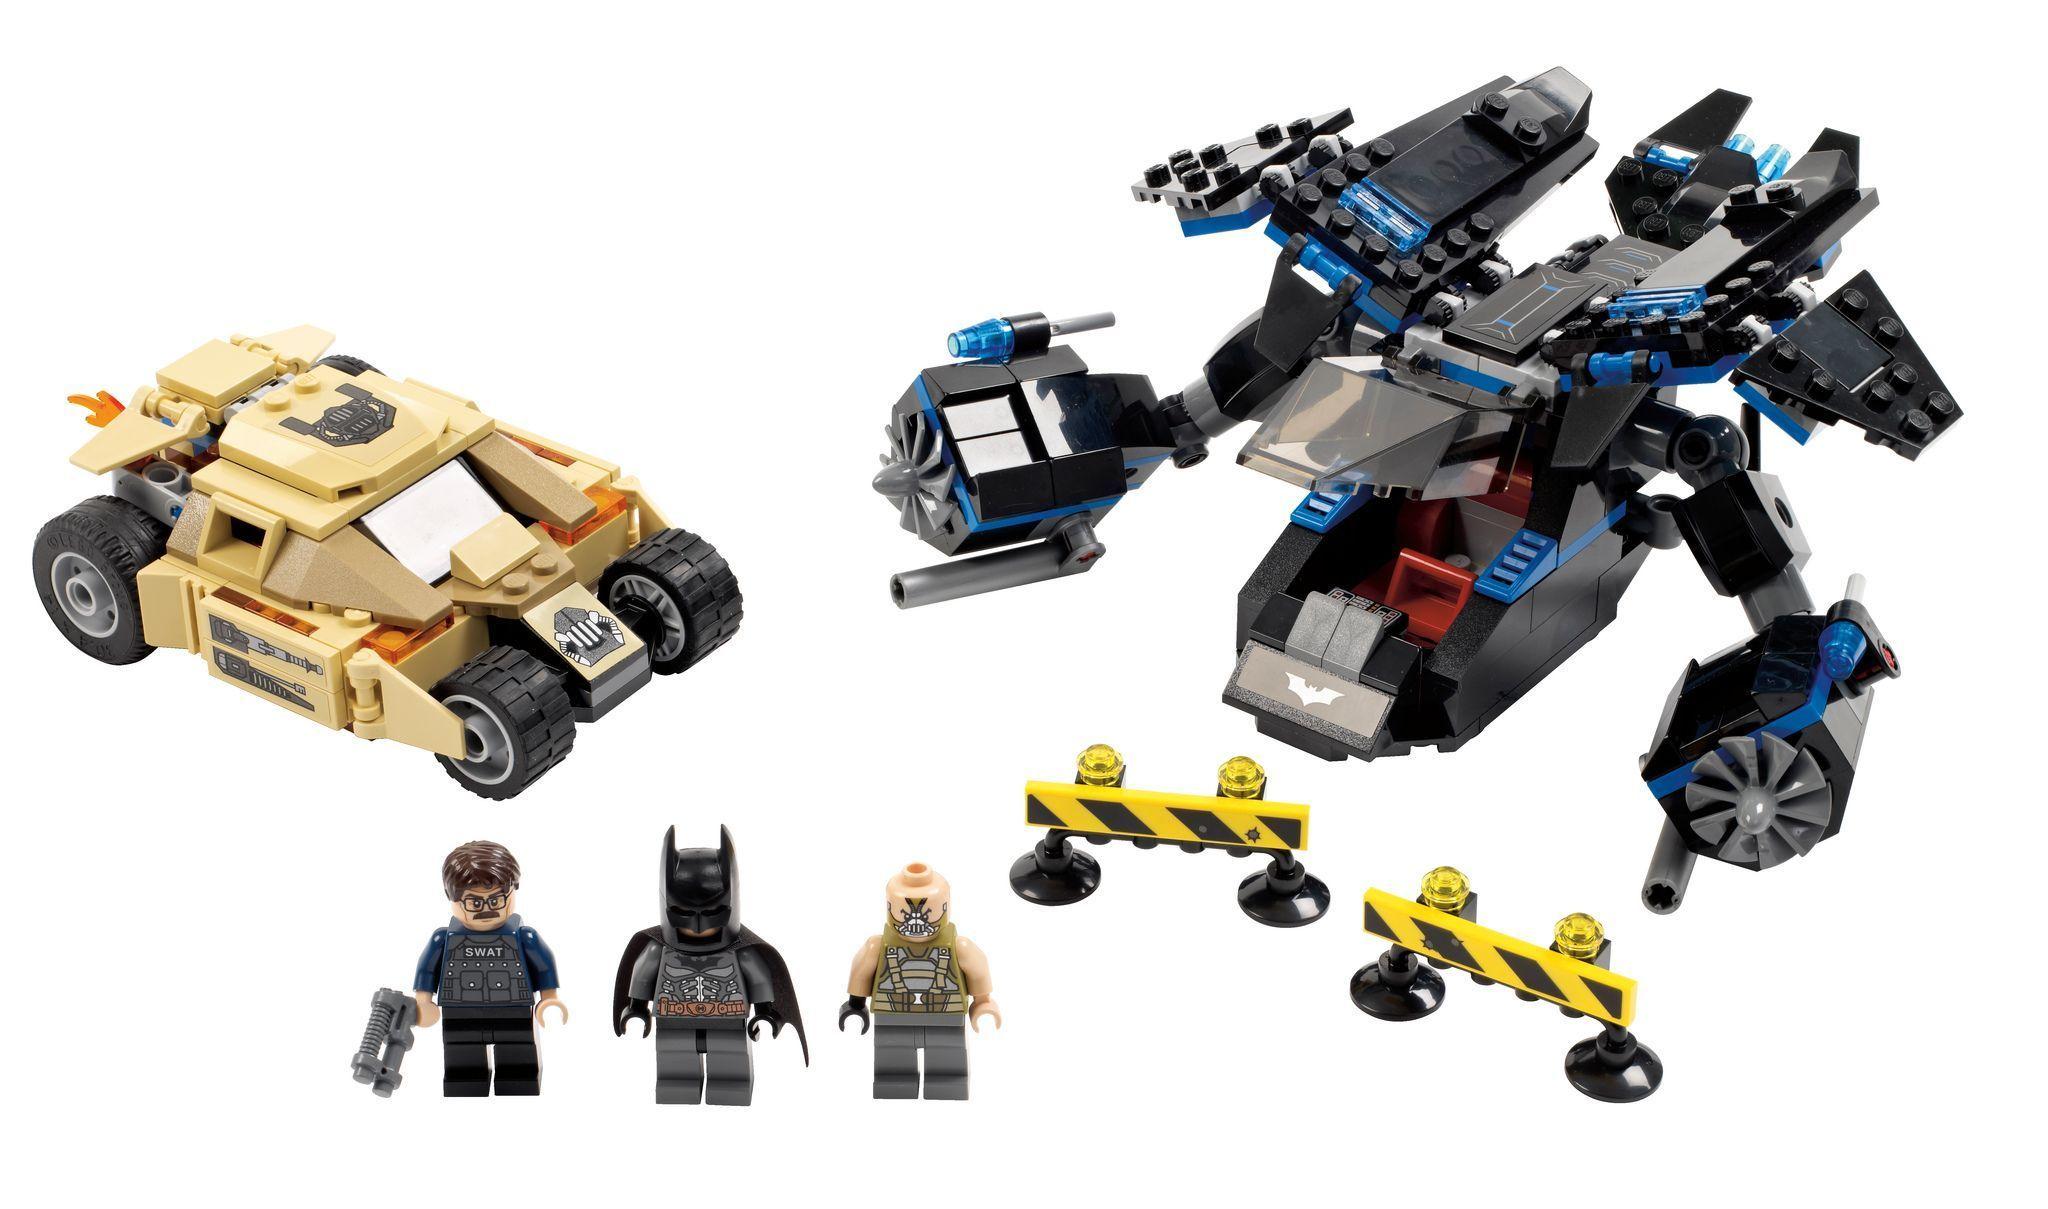 Lego-Batman-The-Bat-Bane-Tumble-Chase